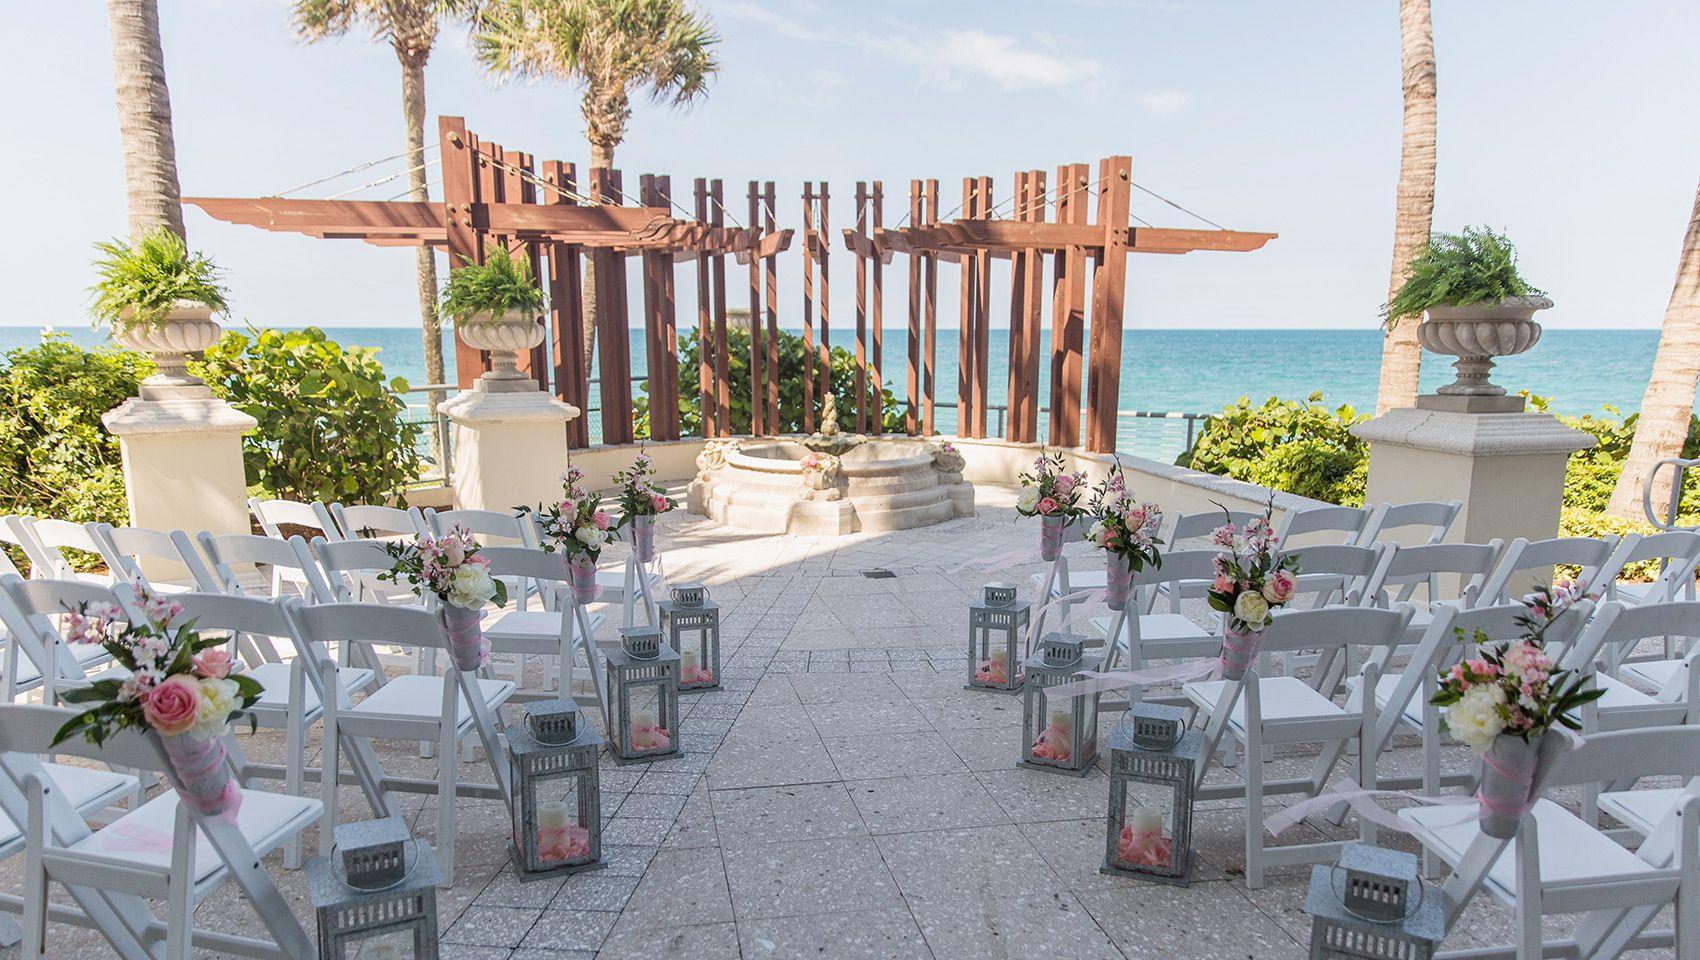 Vero Beach Hotel Photos Kimpton Vero Beach Hotel Spa Photos Vero Beach Hotels Vero Beach Hotel And Spa Wedding Venue Prices